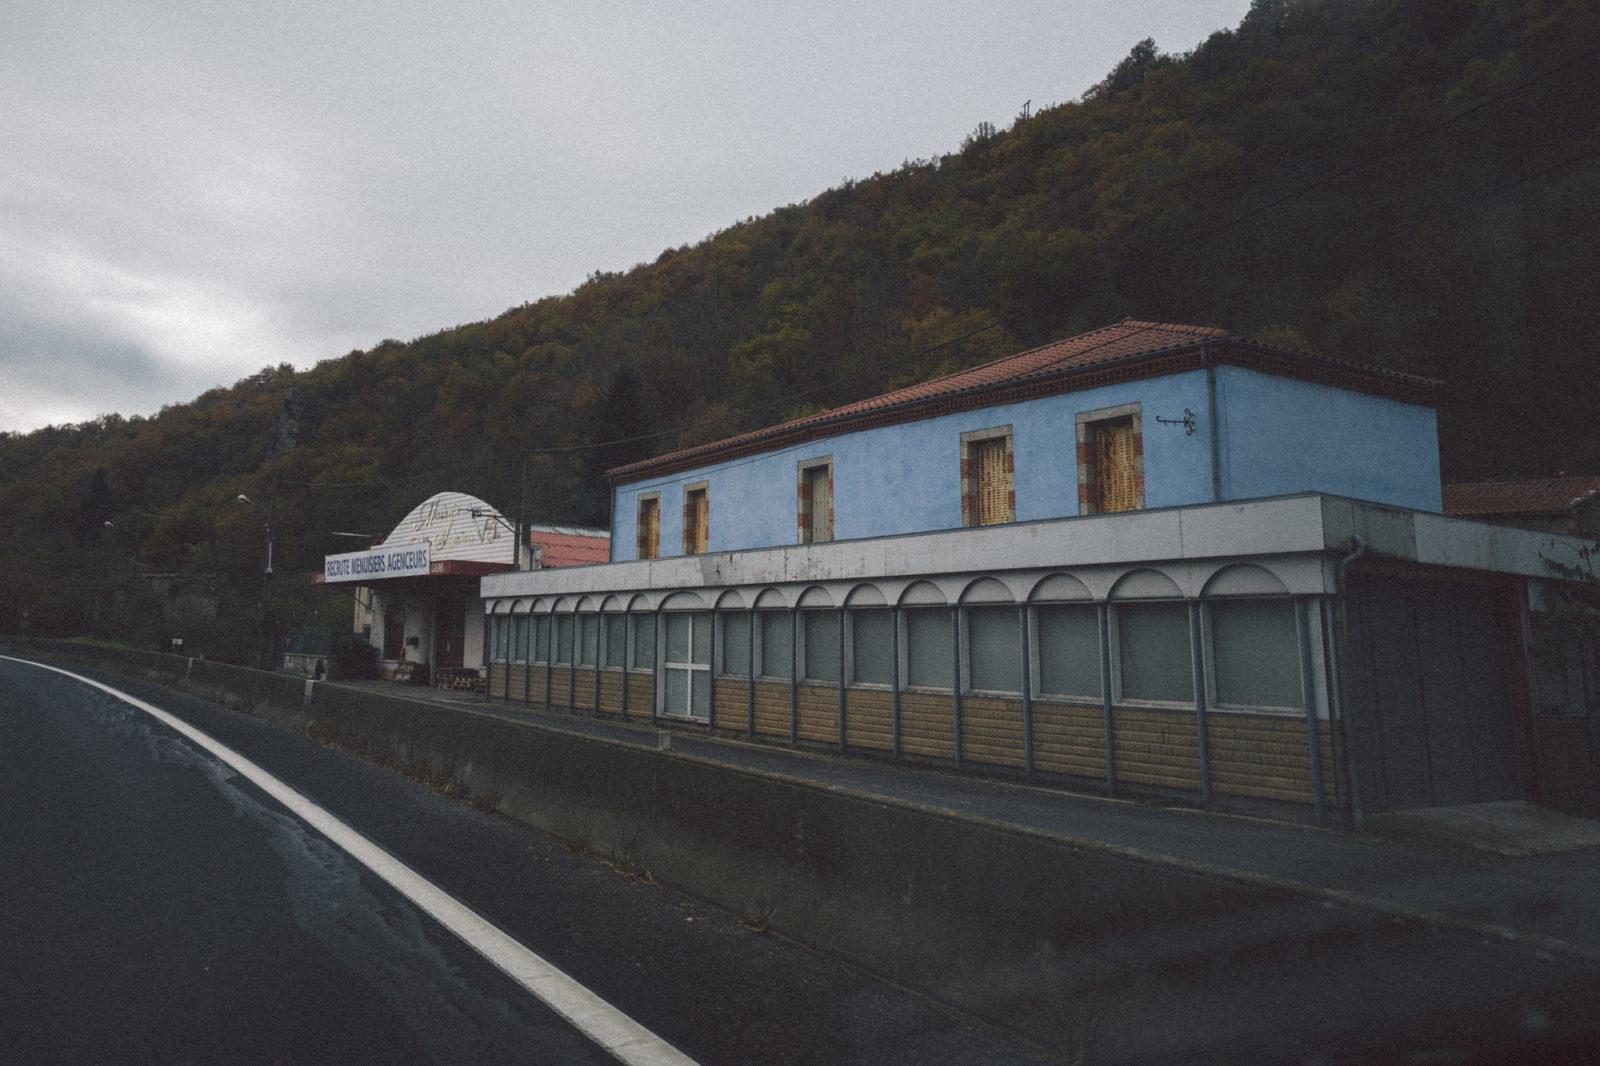 Reise-1060648